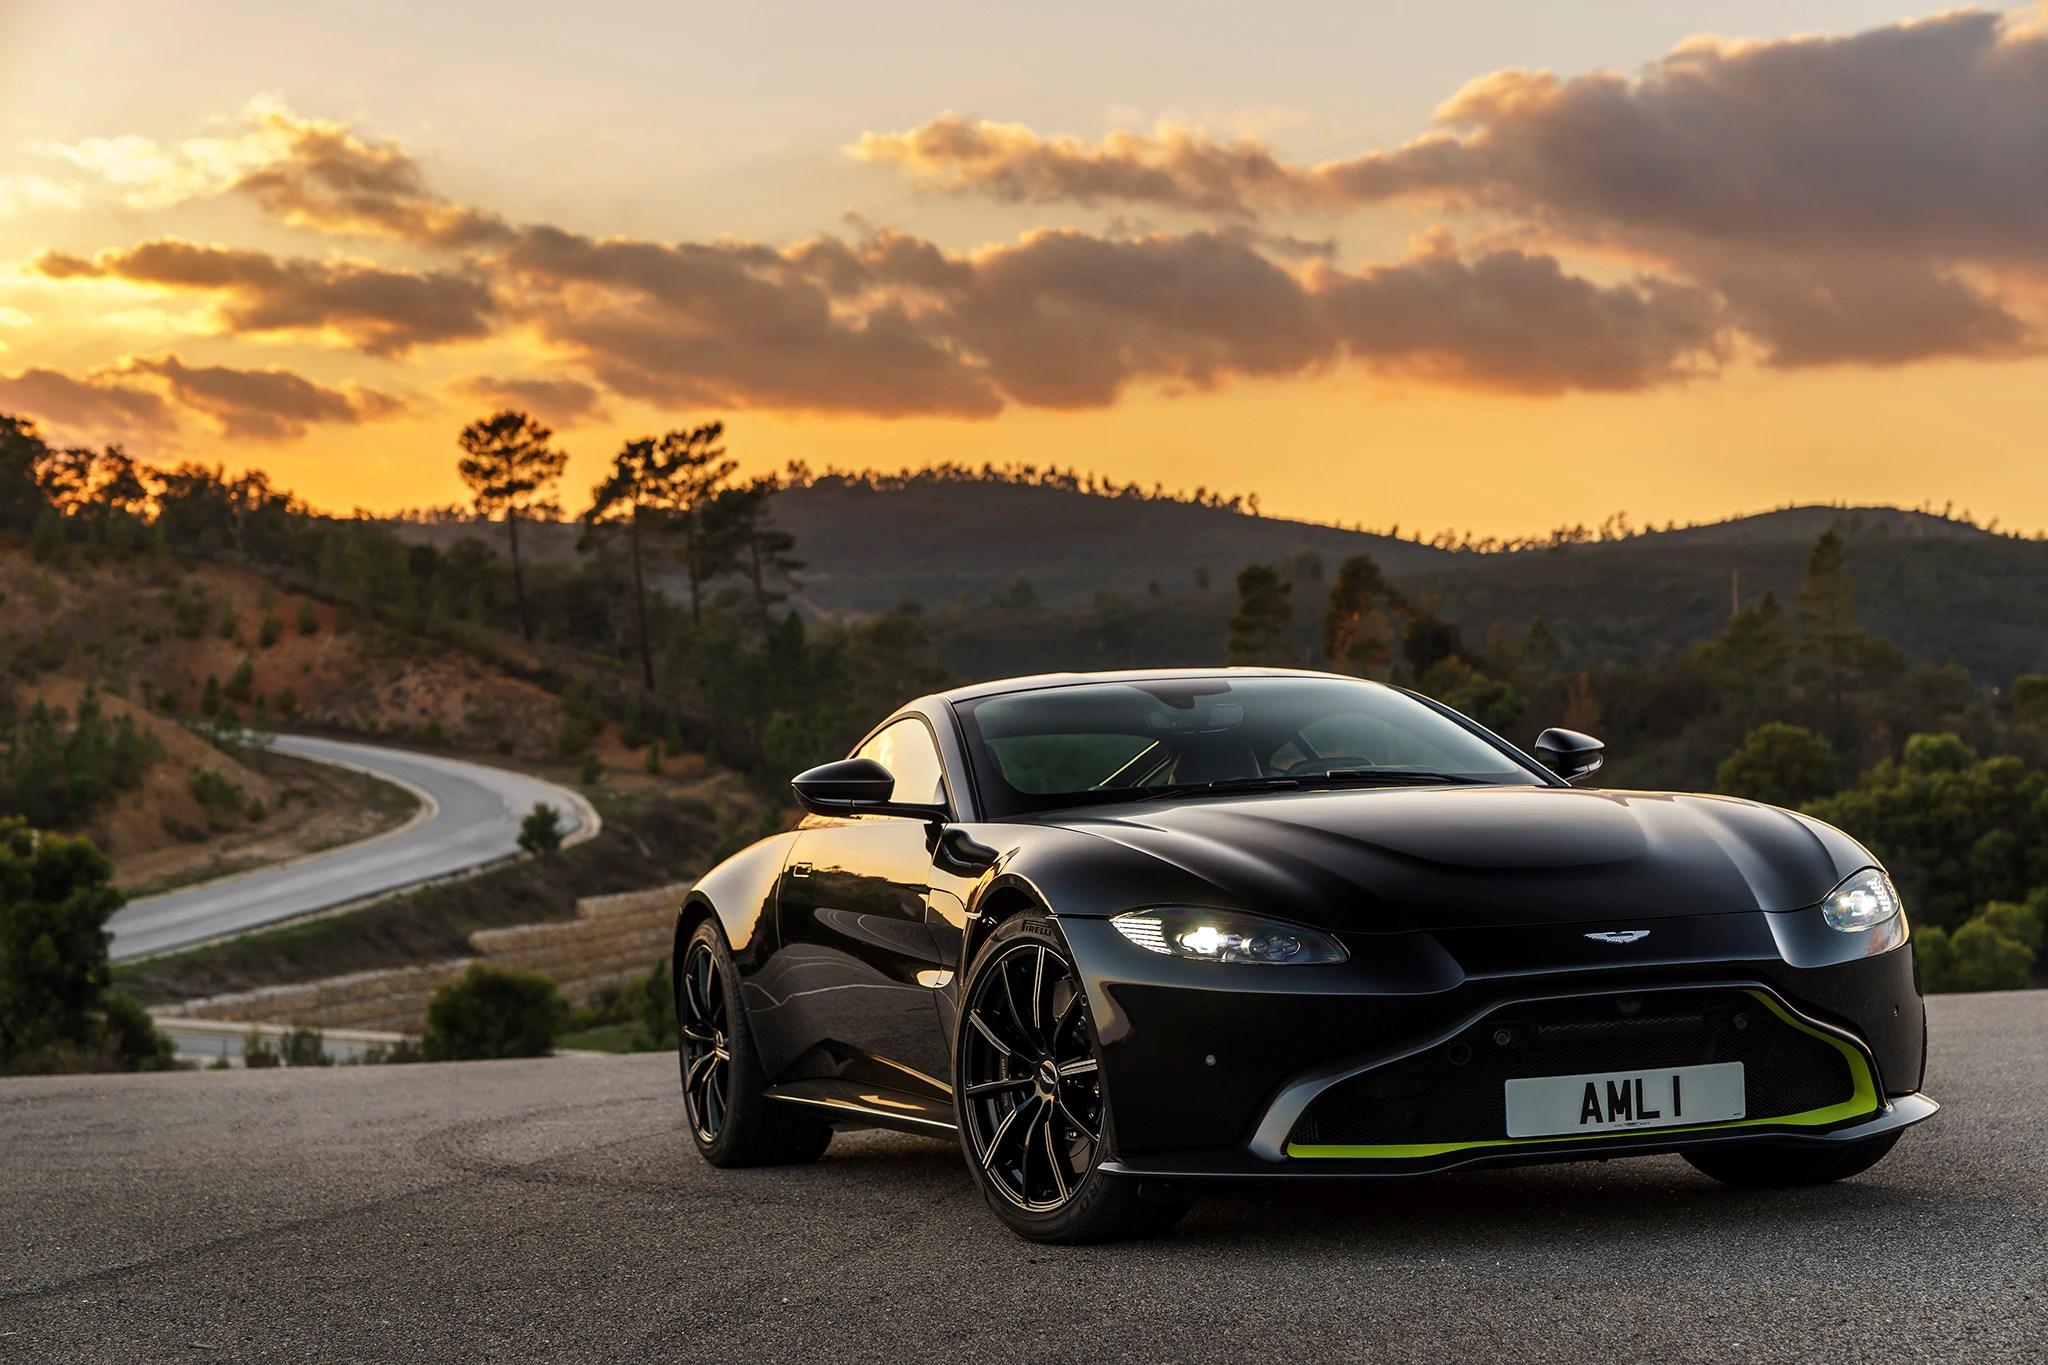 2019 Aston Martin V8 Vantage First Drive Review ...